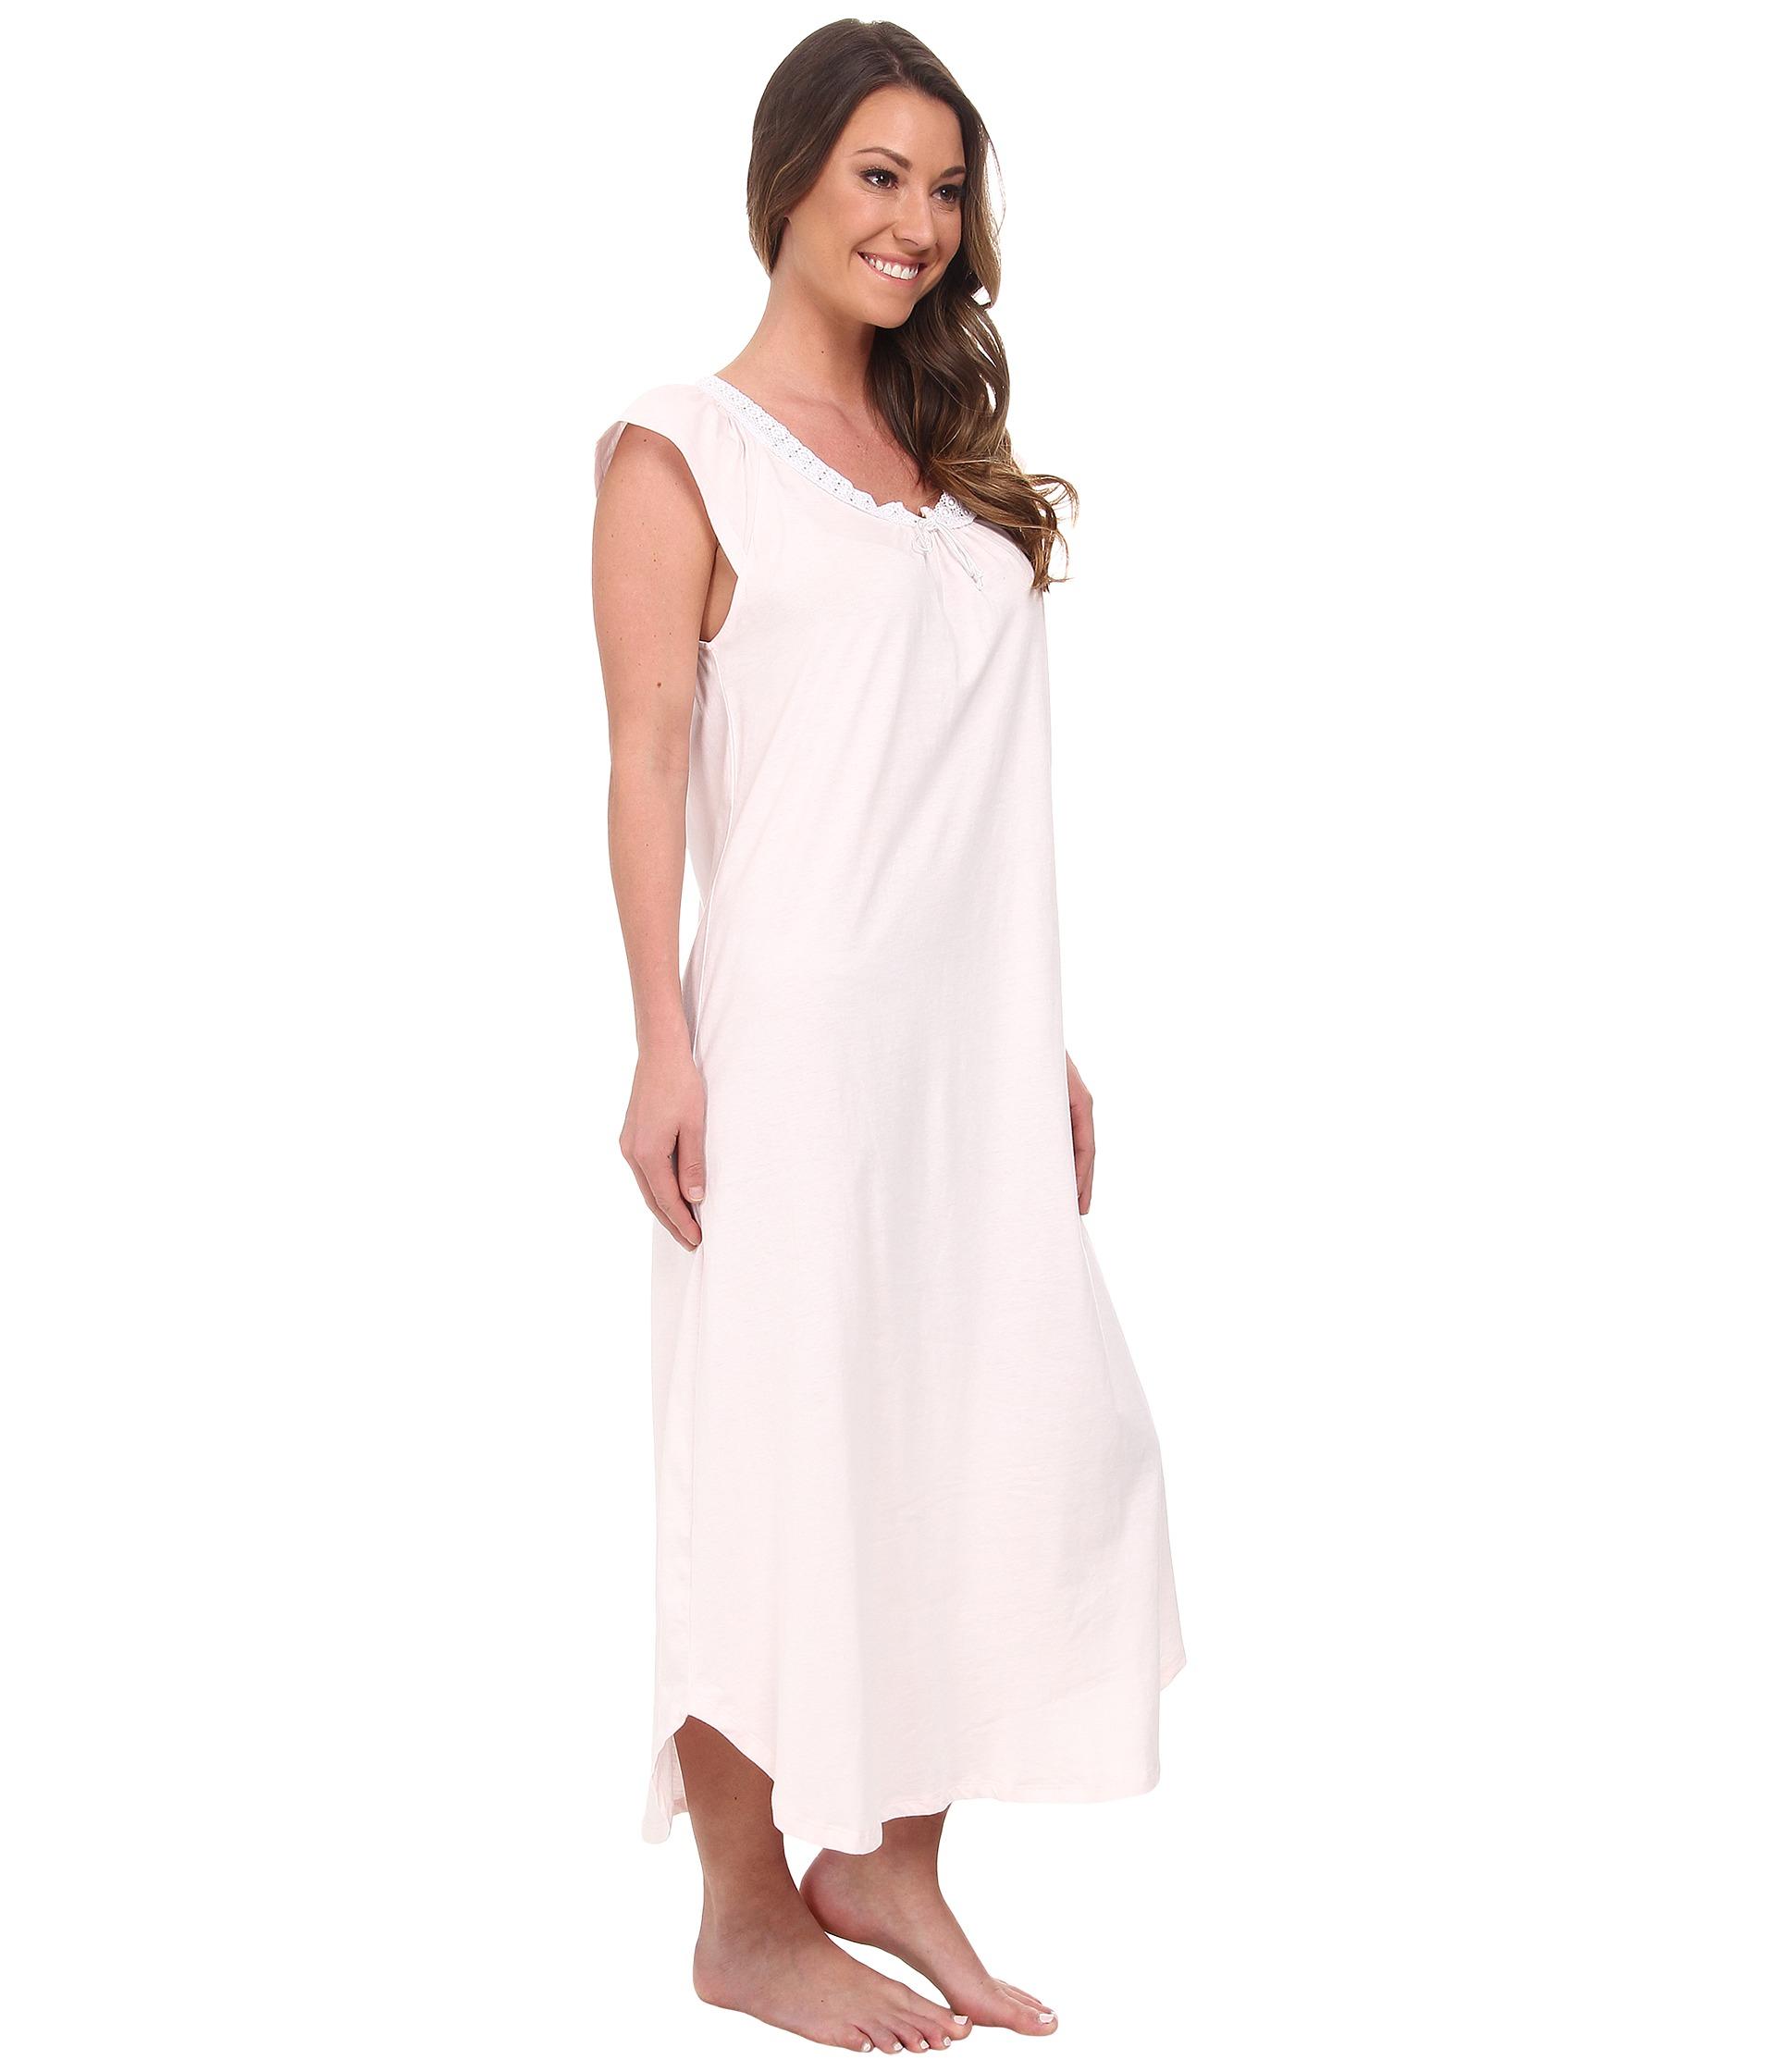 Lyst - Carole Hochman Soft Jersey Long Gown in Pink 00c090469